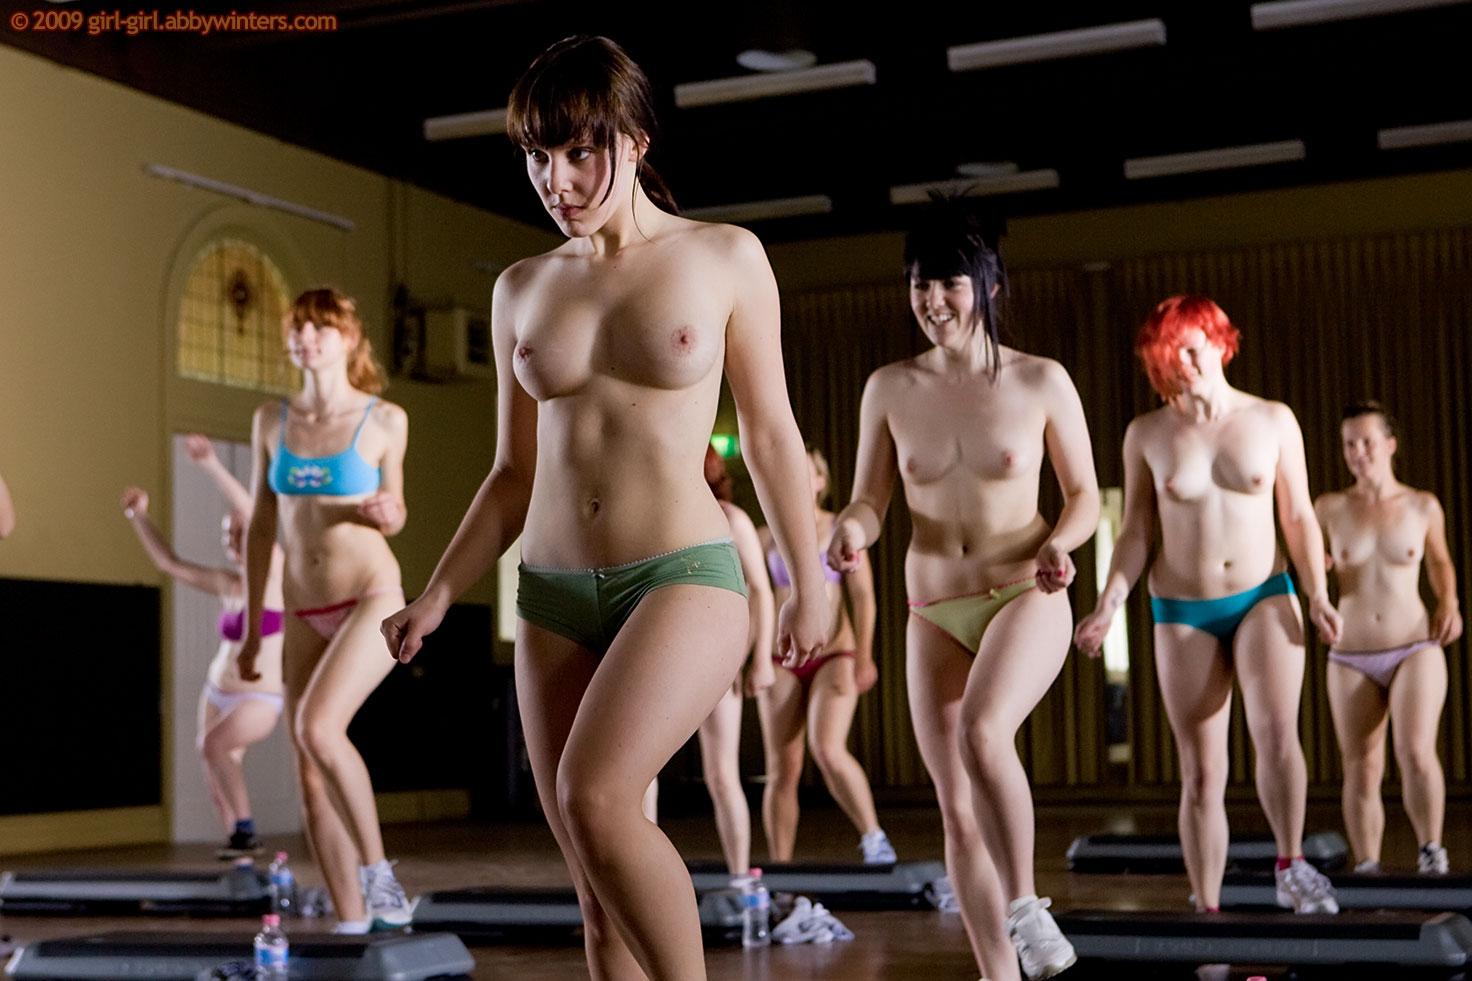 Abby Winters Step Aerobics Girls